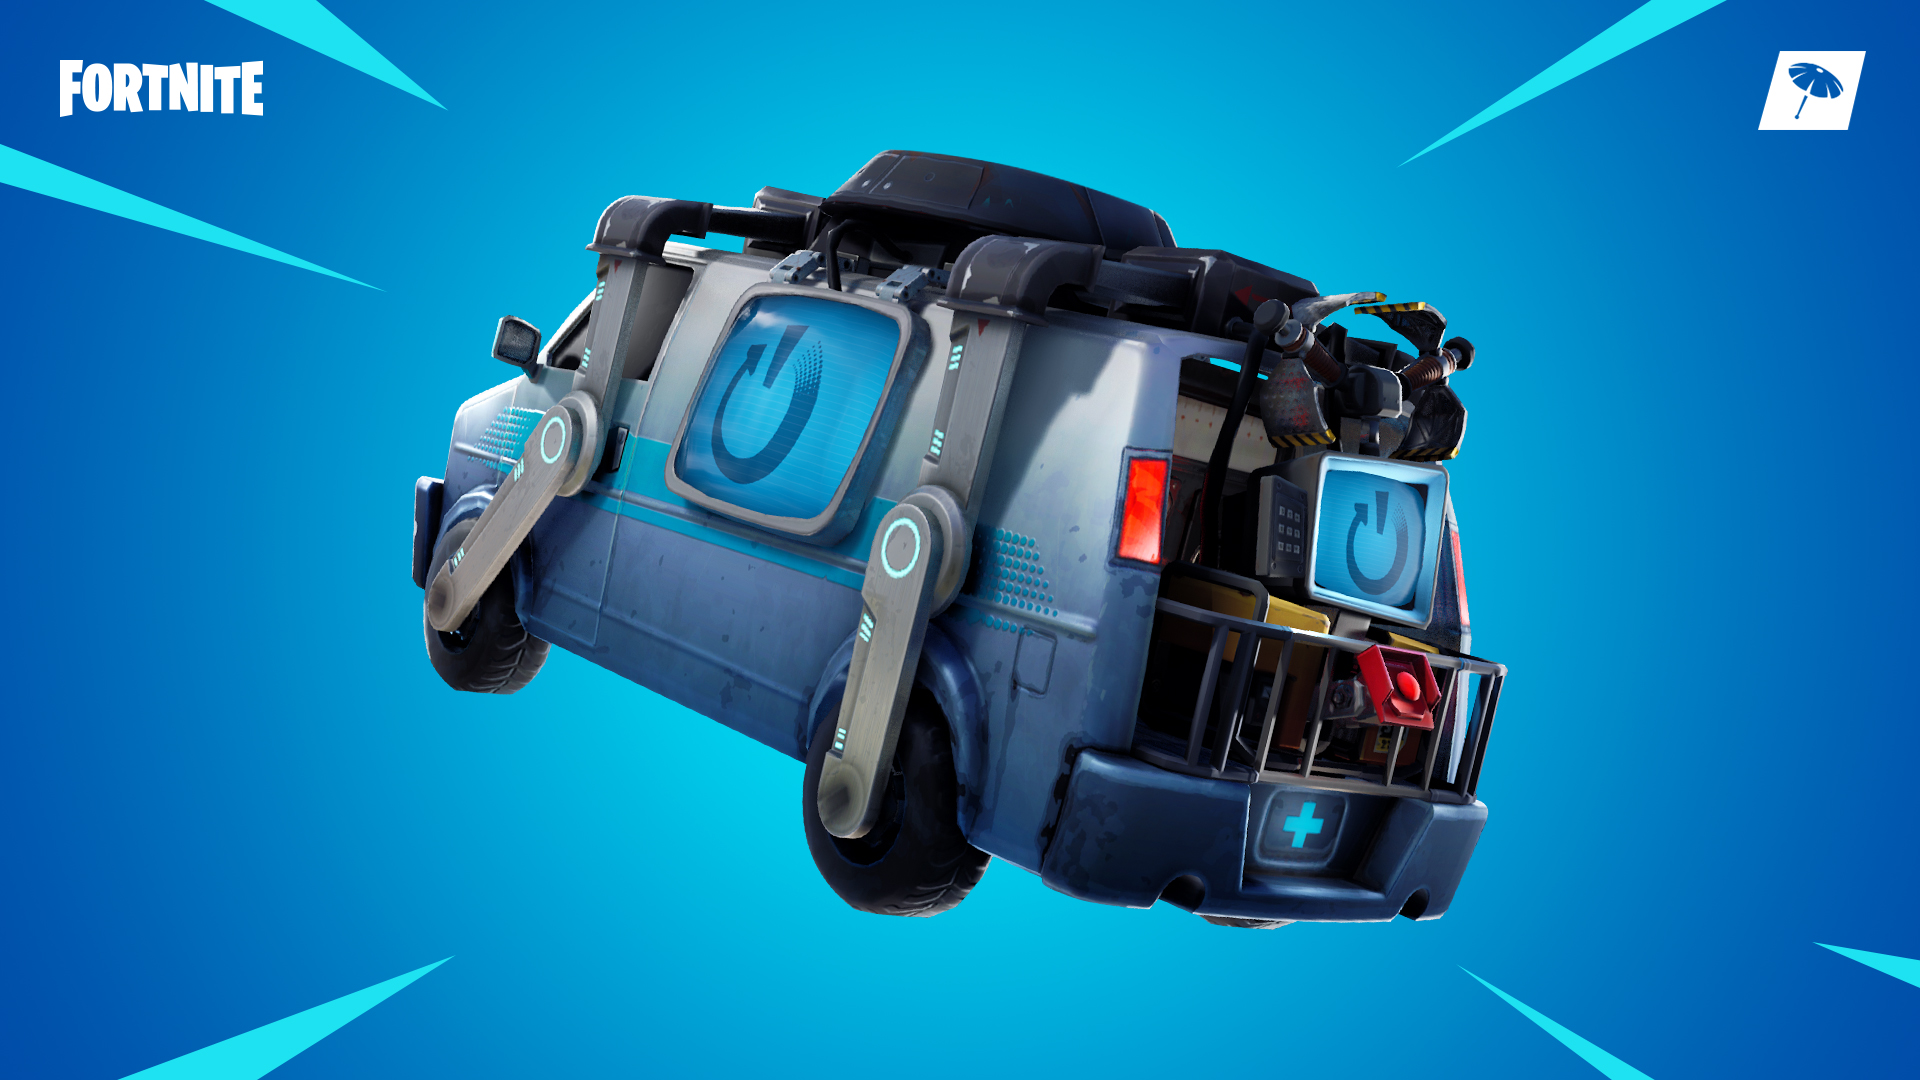 Reboot Van added in latest Fortnite season 8 patch